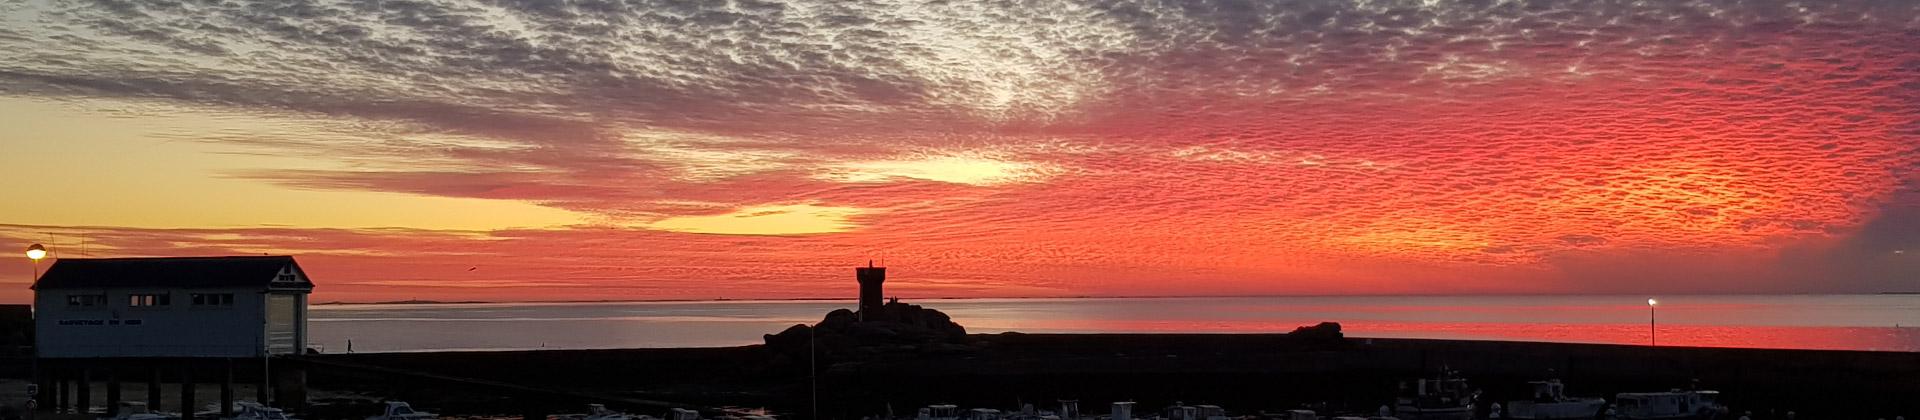 Sunset at Trévignon